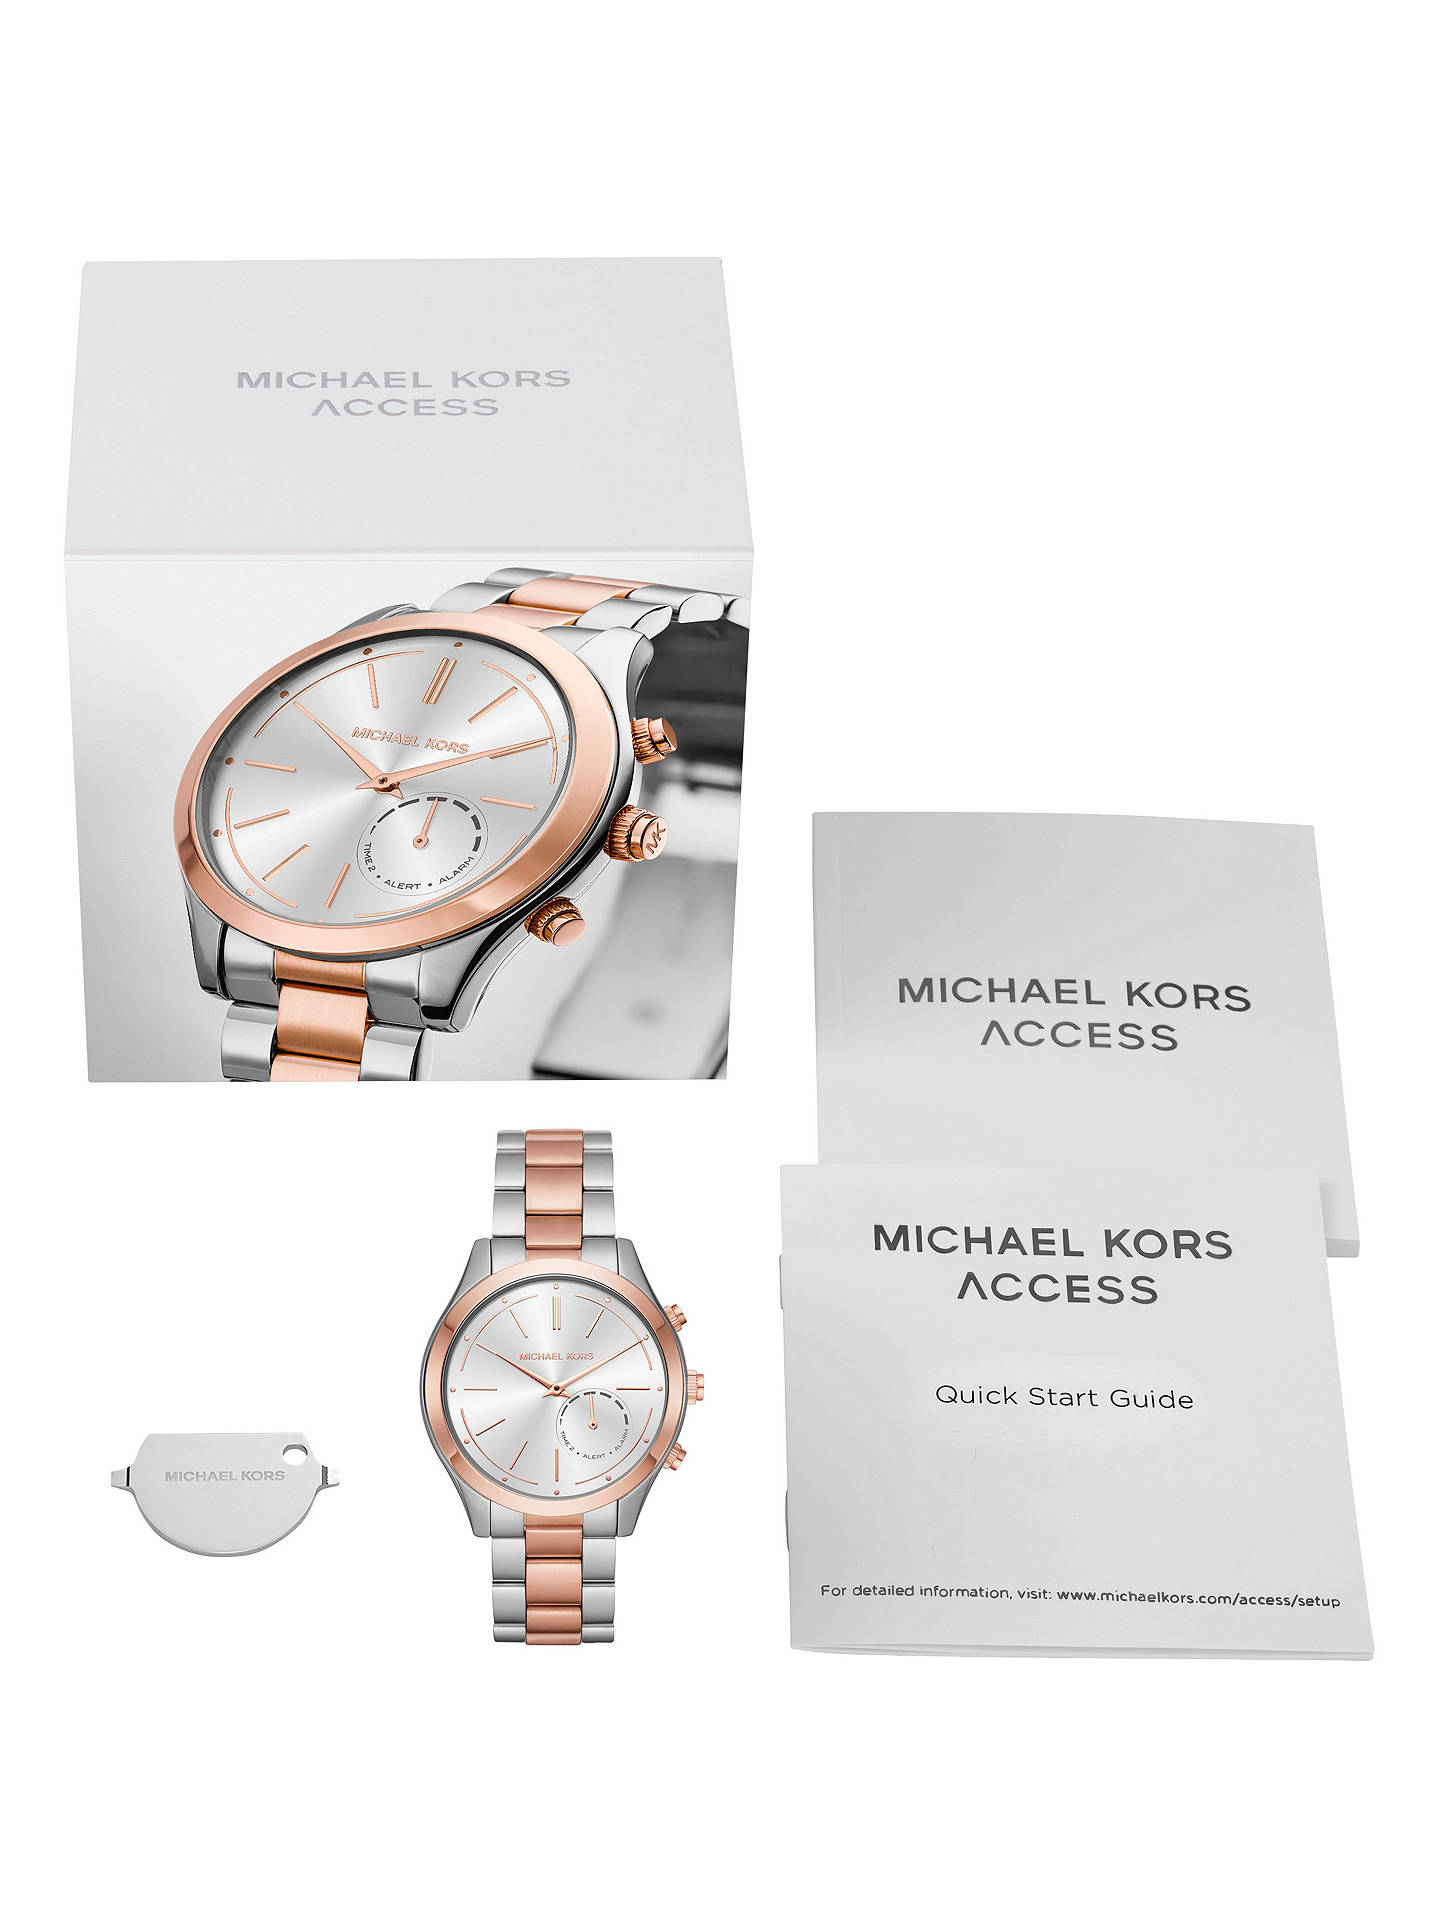 bbc136e05 ... Buy Michael Kors Access MKT4018 Women's Slim Runway Bracelet Strap Hybrid  Smartwatch, Rose Gold/